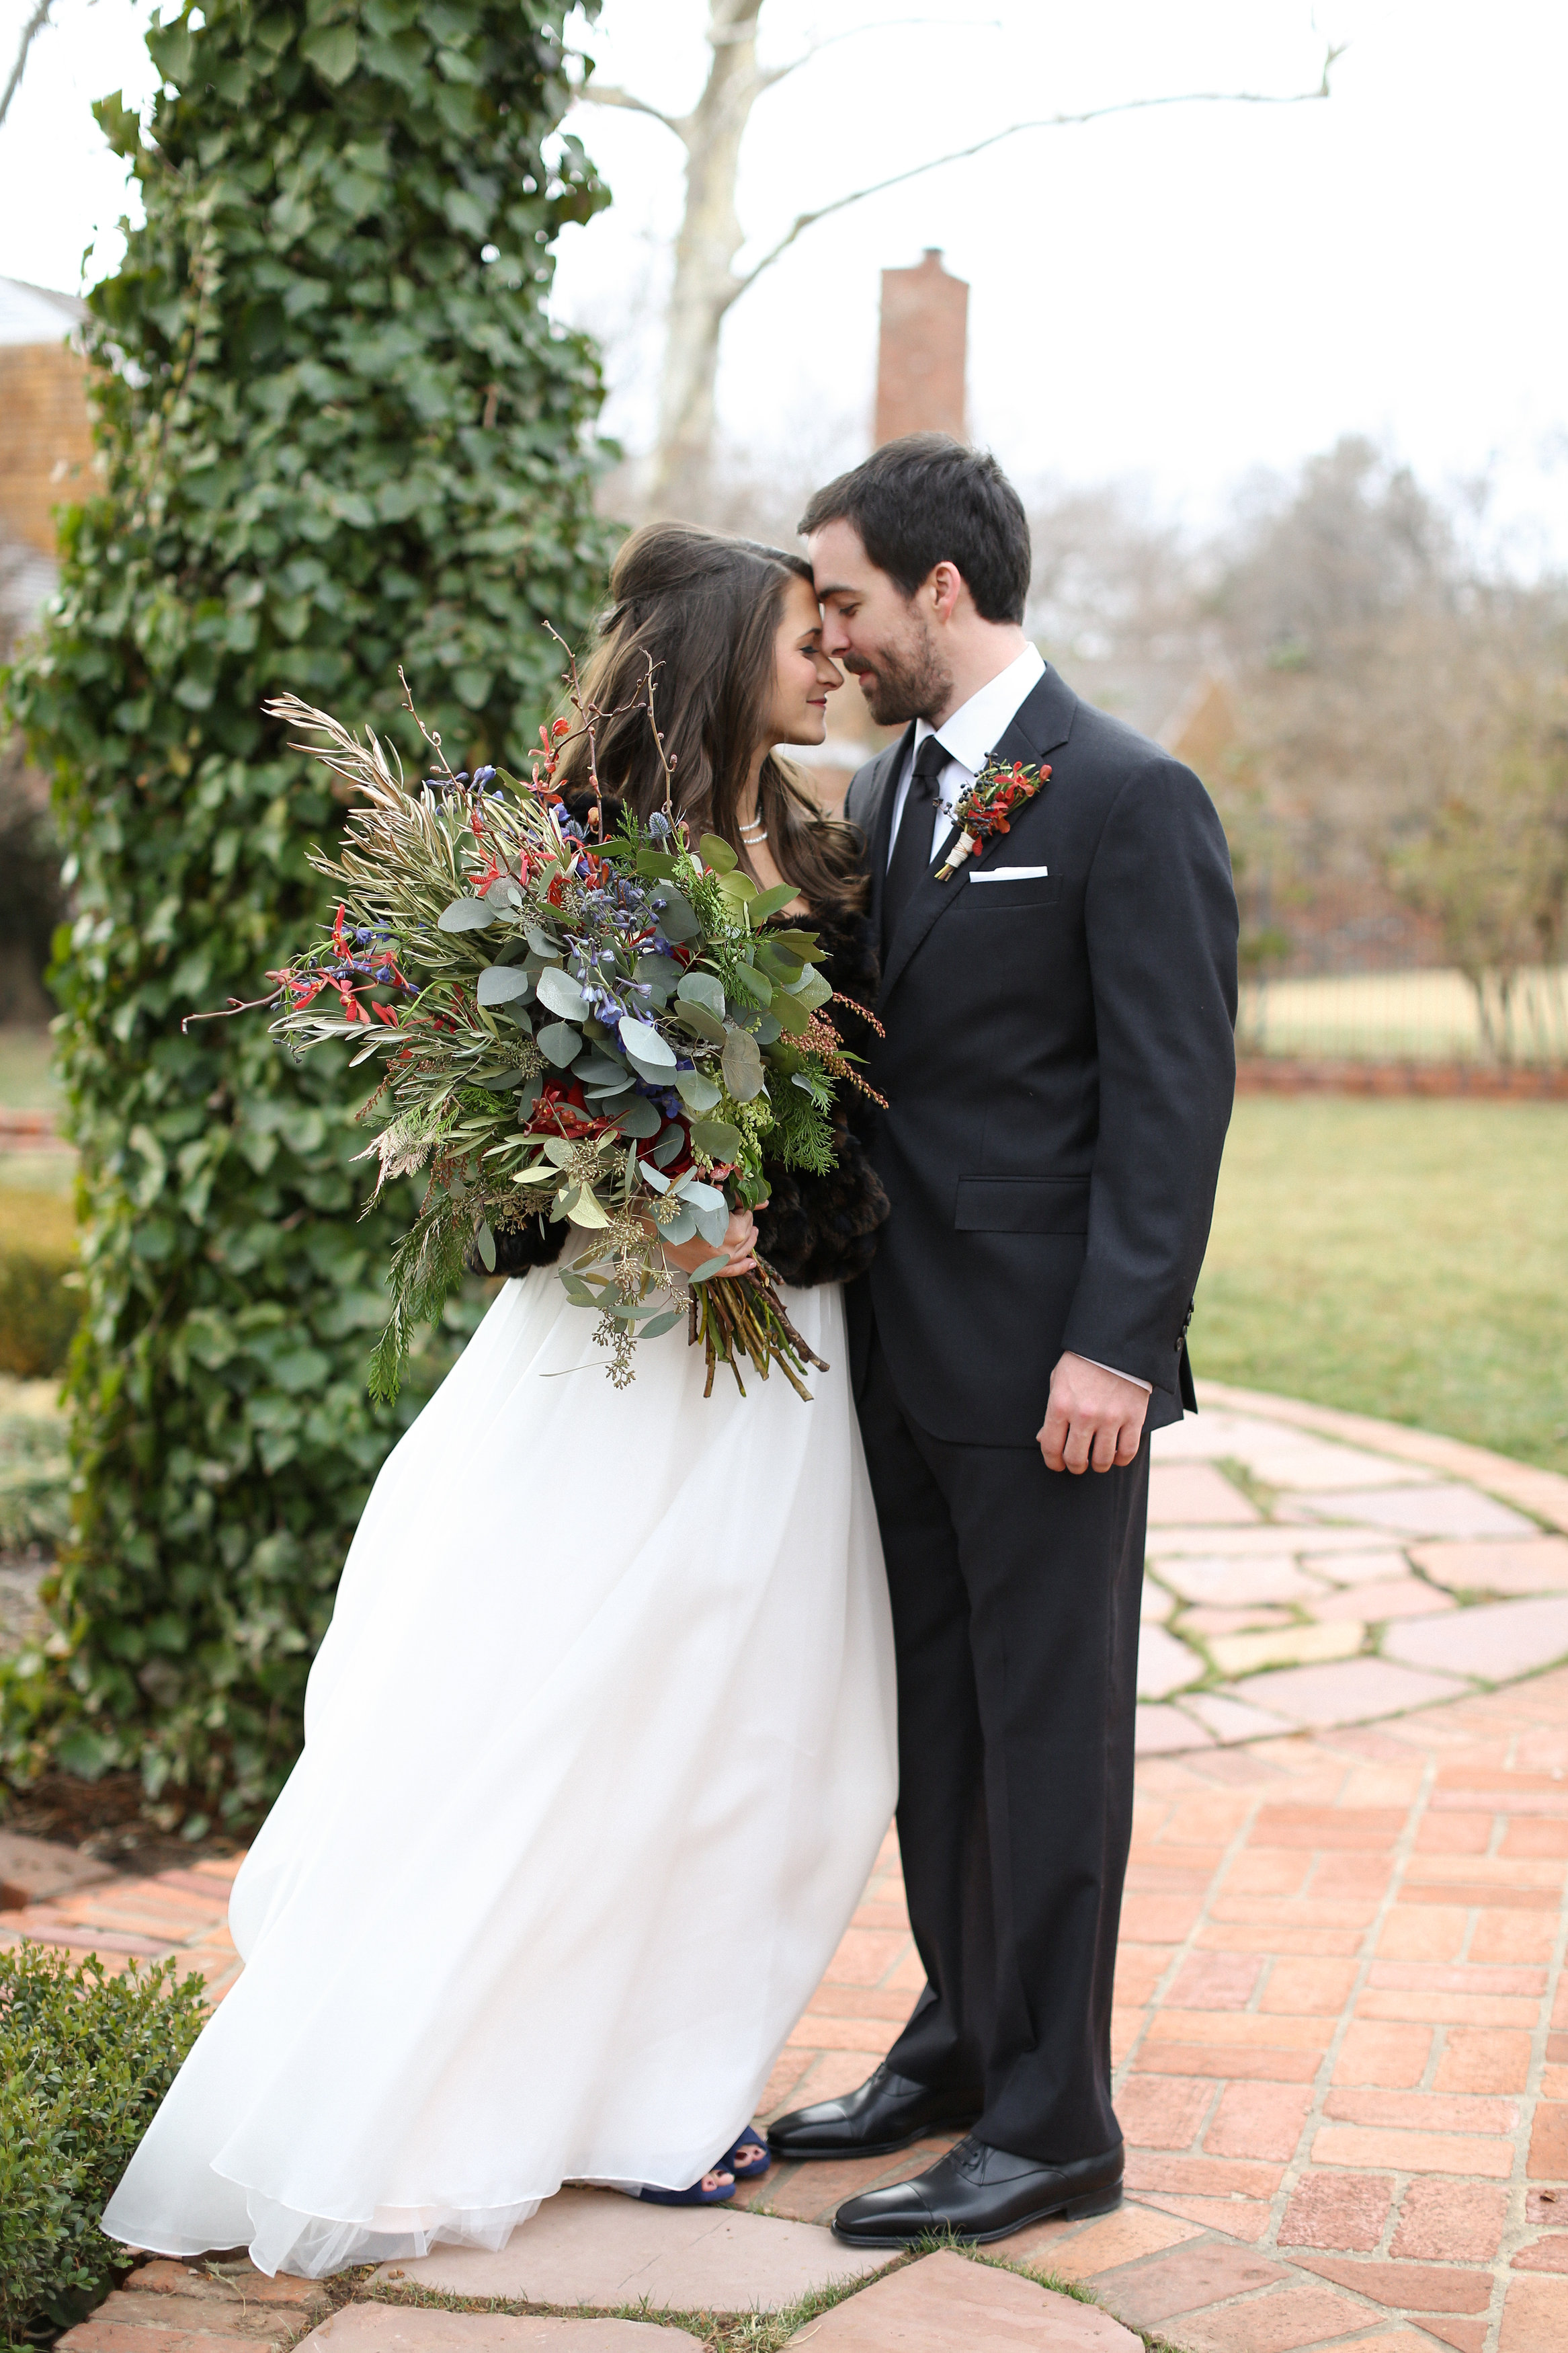 Aaron_Snow_Photography_Dick-Jordan_Wedding_Alone.052.jpg